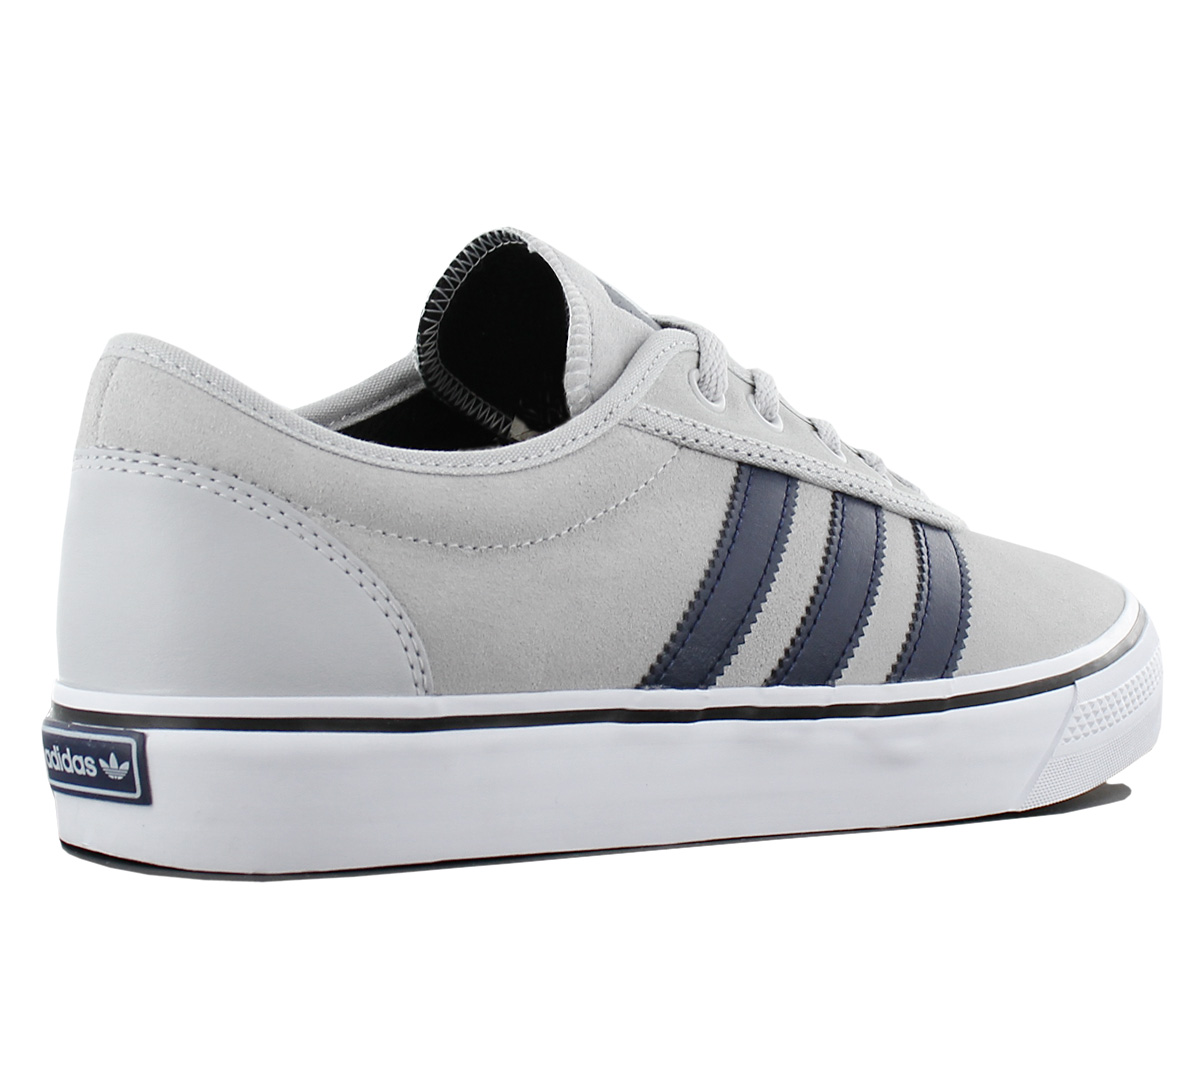 Details zu adidas Originals Adi Ease Herren Sneaker Schuhe Leder Grau Skaterschuhe BB8475